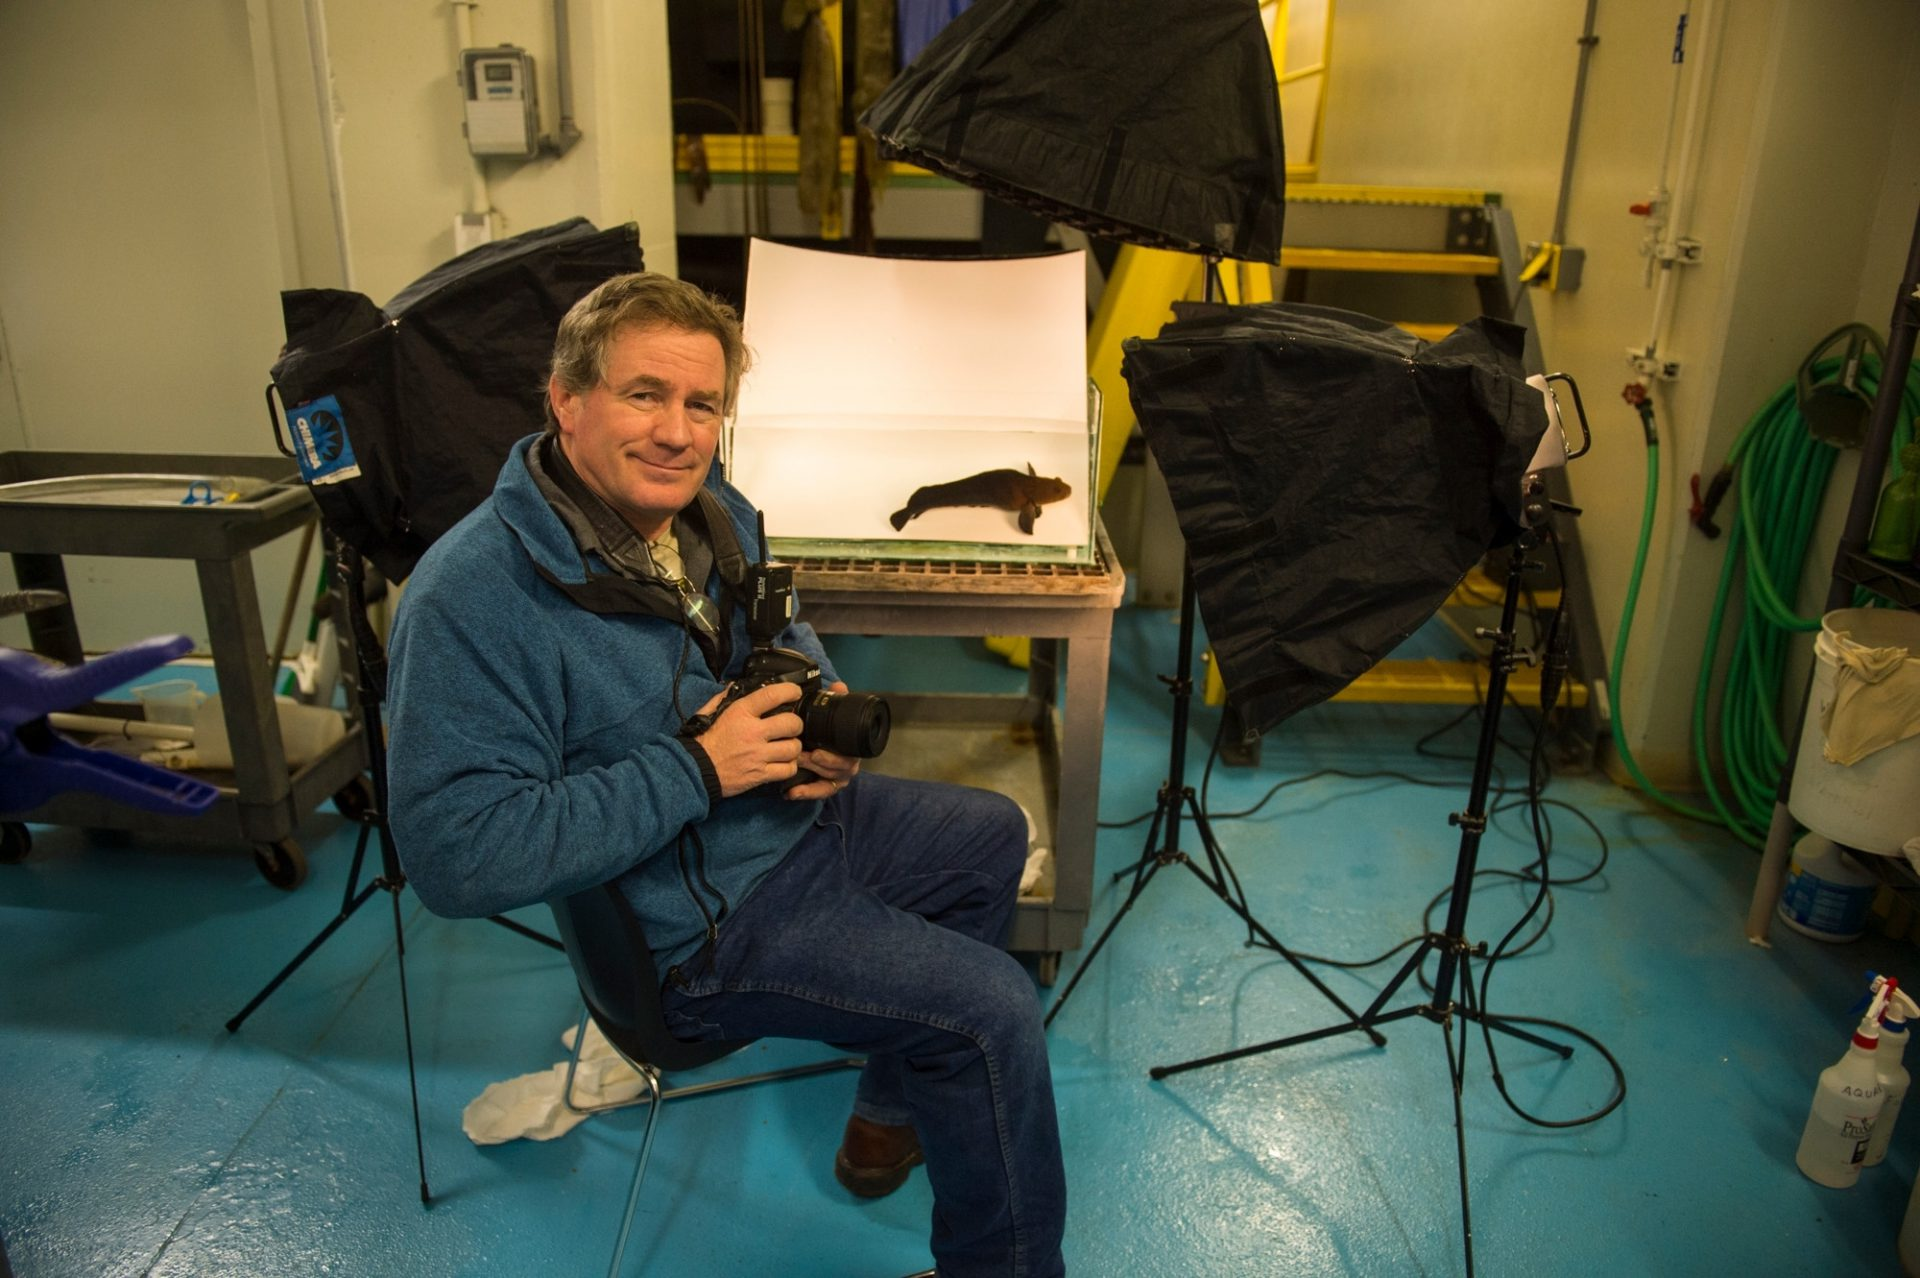 Photo: A photographer prepares for a photo shoot at the Alaska SeaLife Center in Seward, AK.